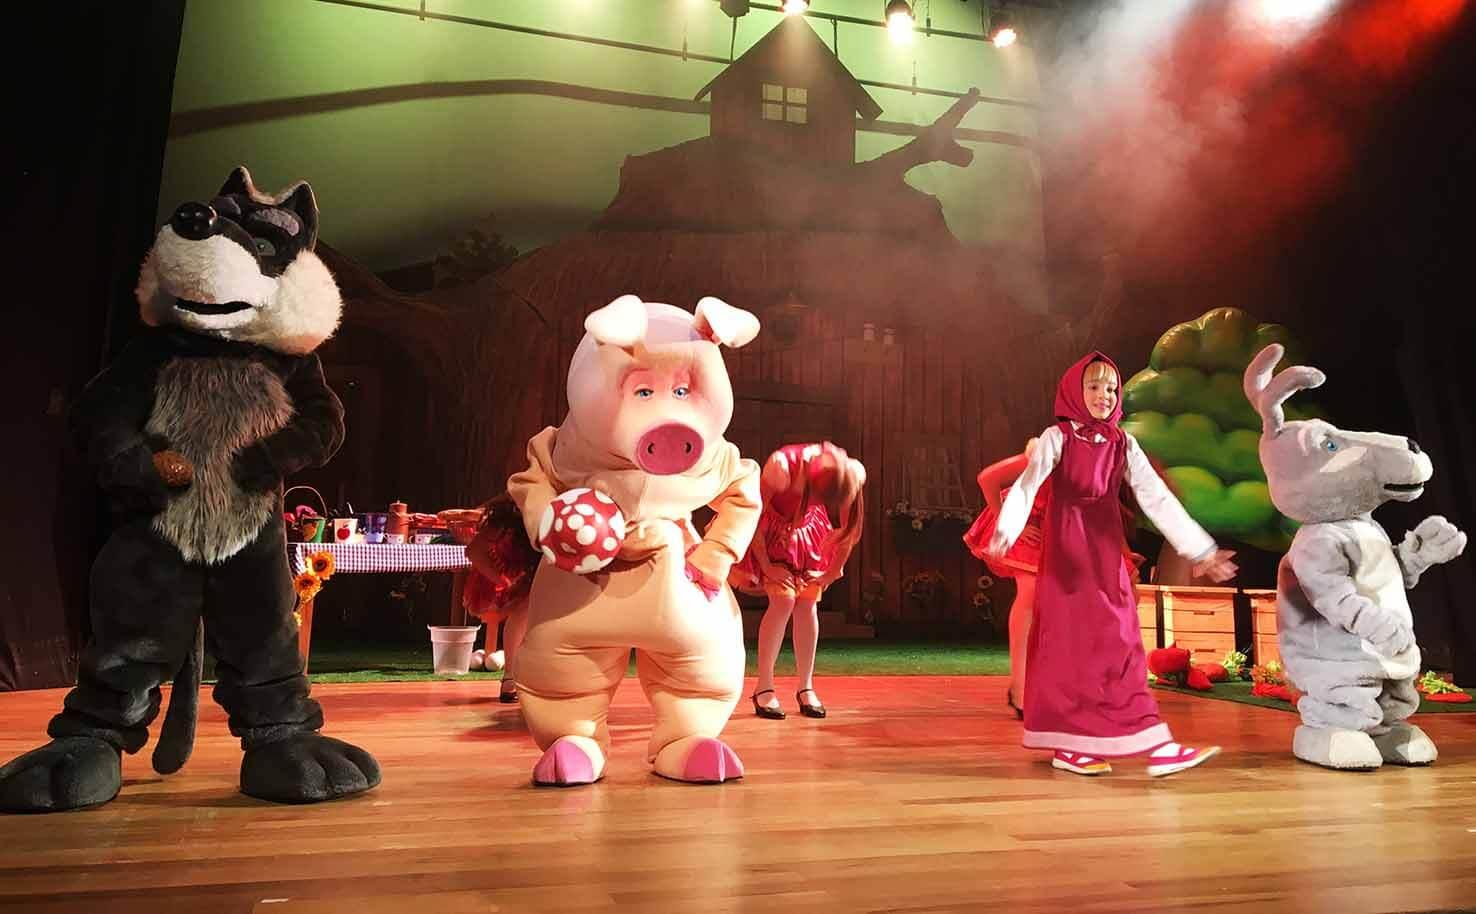 Masha e o Urso Curitiba3 (1)